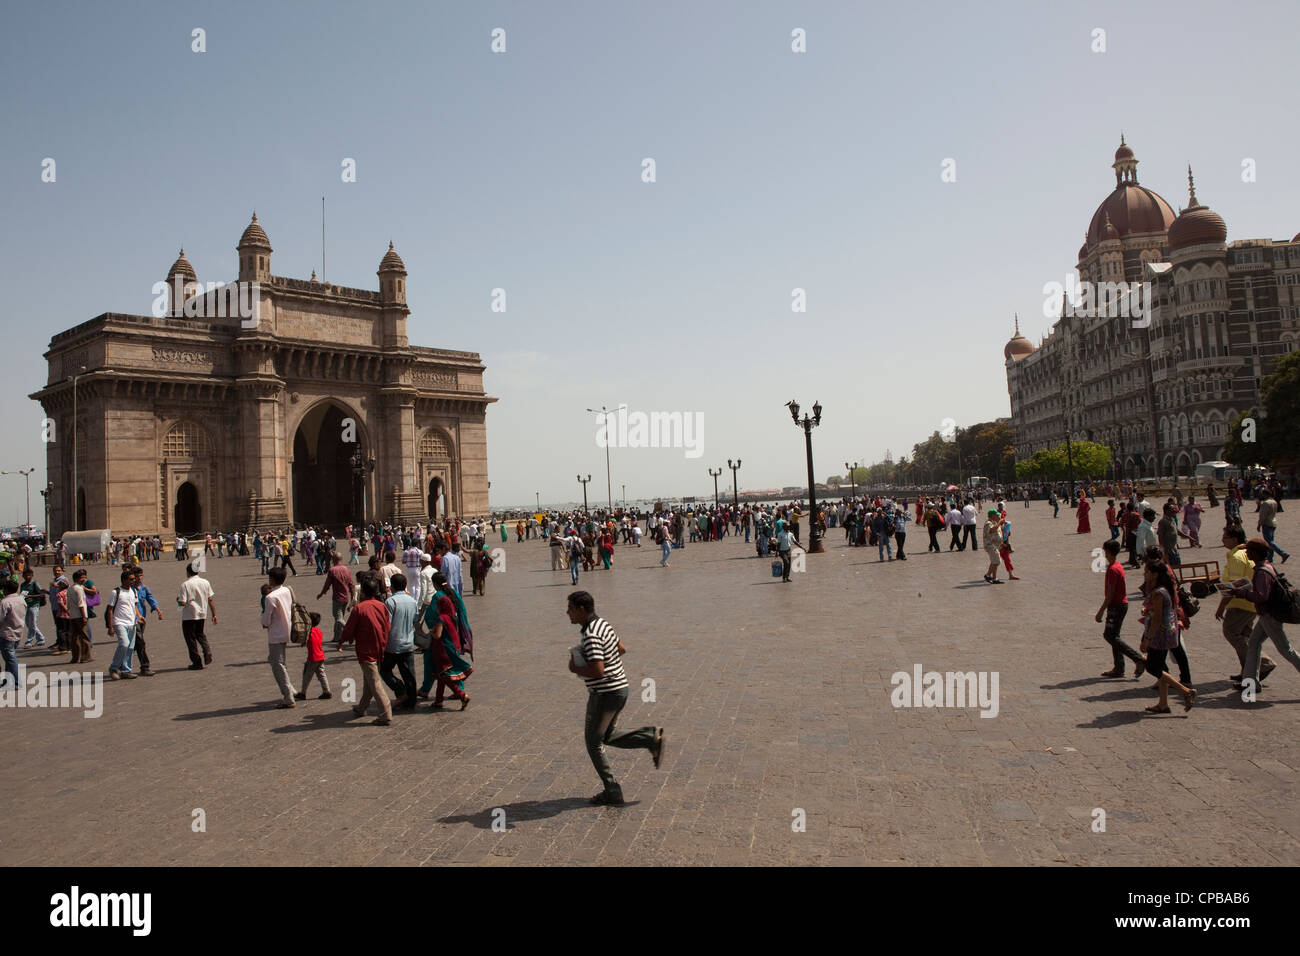 Puerta de entrada a la India - Mumbai (Bombay) Imagen De Stock